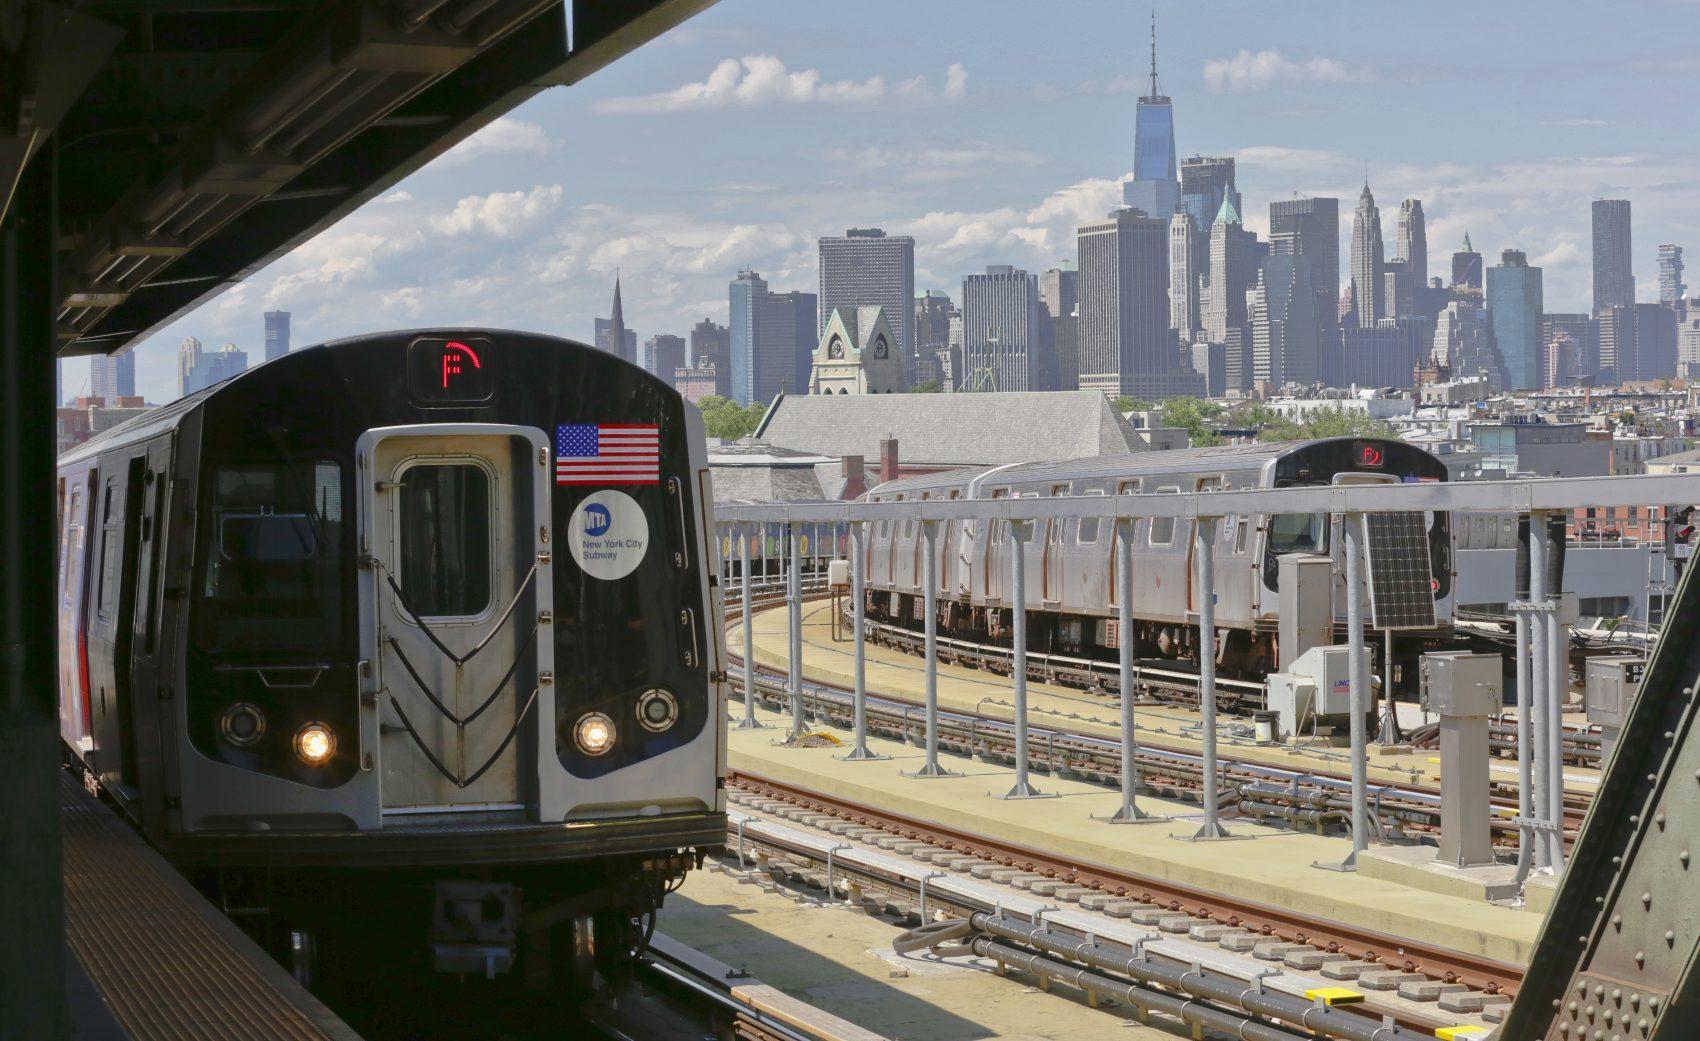 new york subways บัตร subway ใน new york  อยากทราบว่าขึ้น subway ใน new york นี้มี unlimited แบบรายวันไหมค่ะ  สมาชิกหมายเลข 1890781.